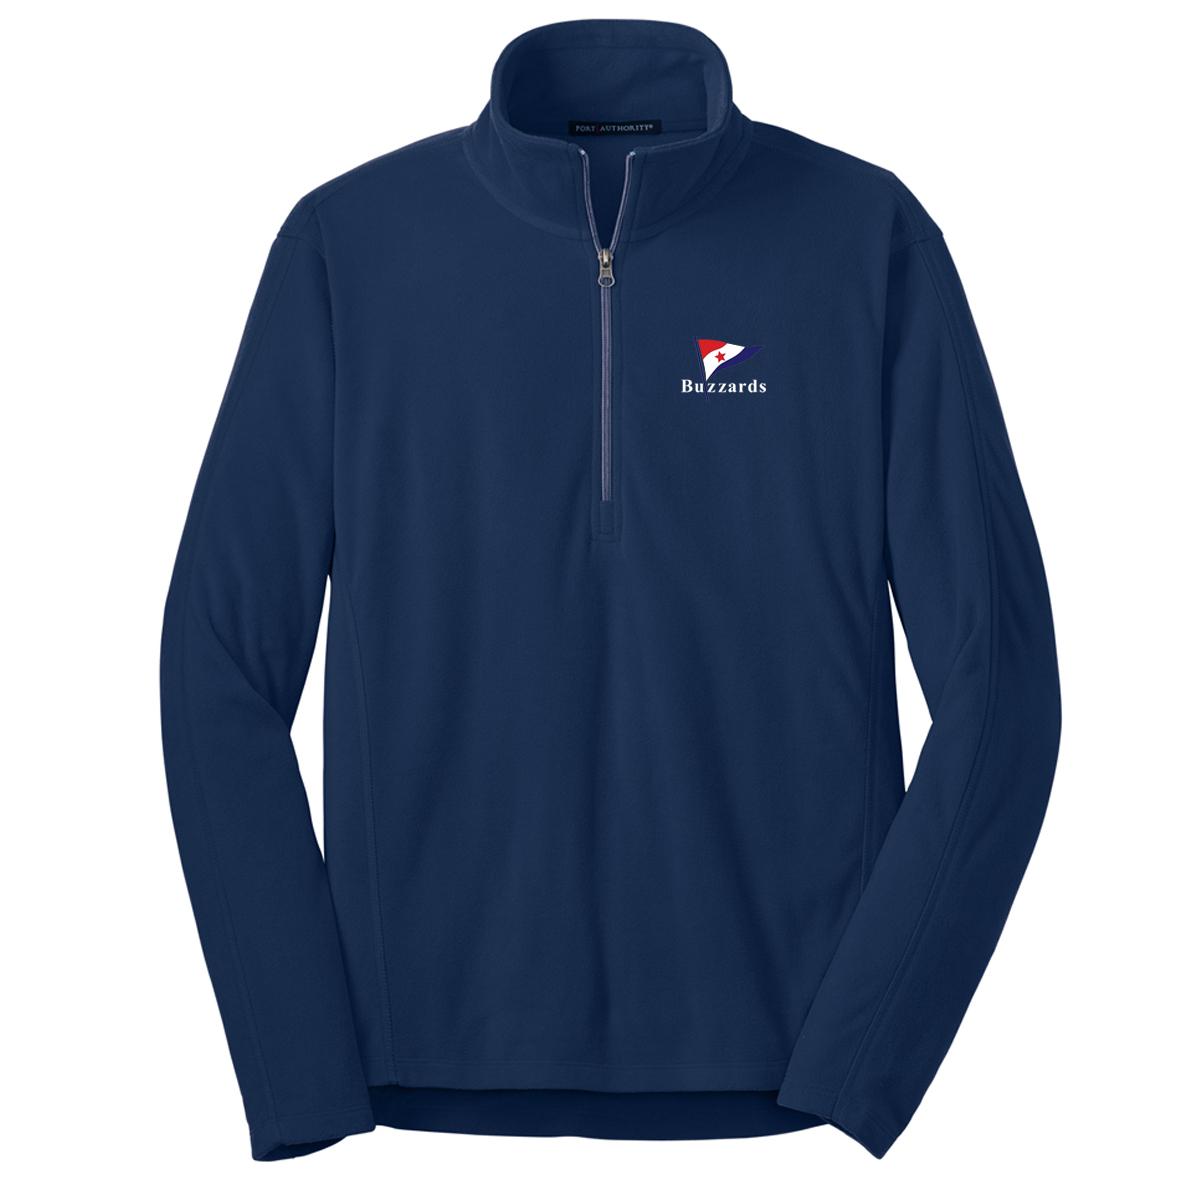 Buzzards Yacht Club - Men's Fleece Pullover (BUZ501)